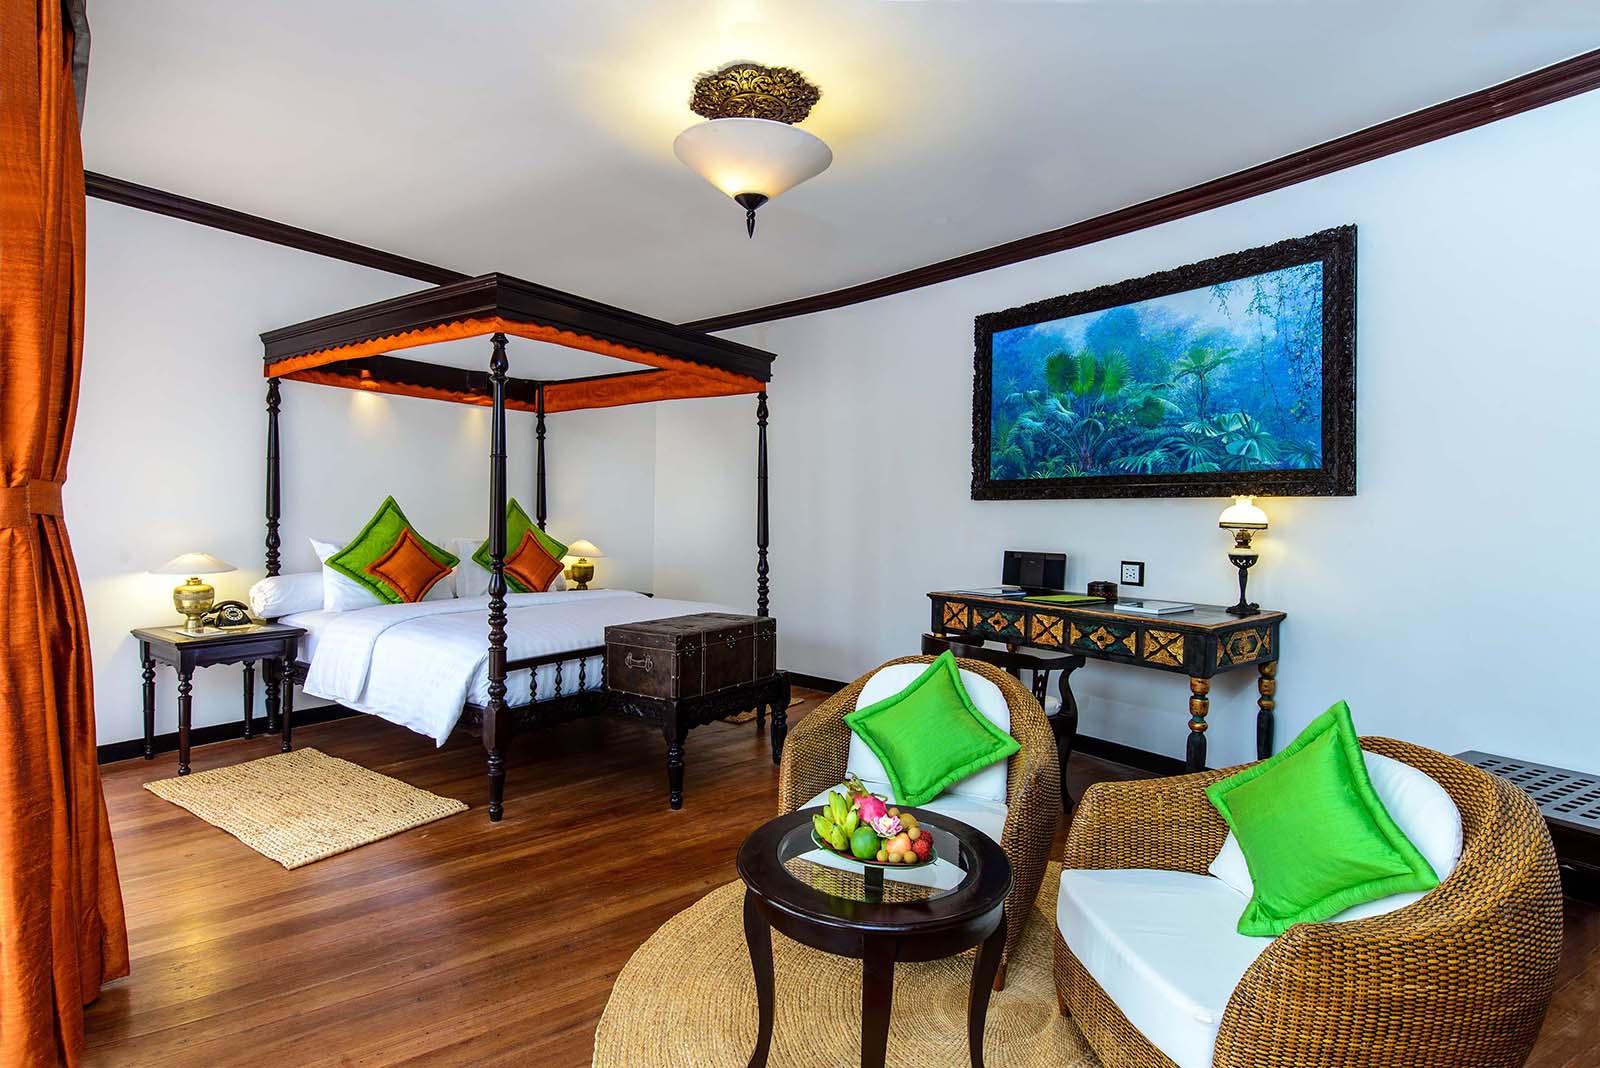 Spencer Creative - Hotels